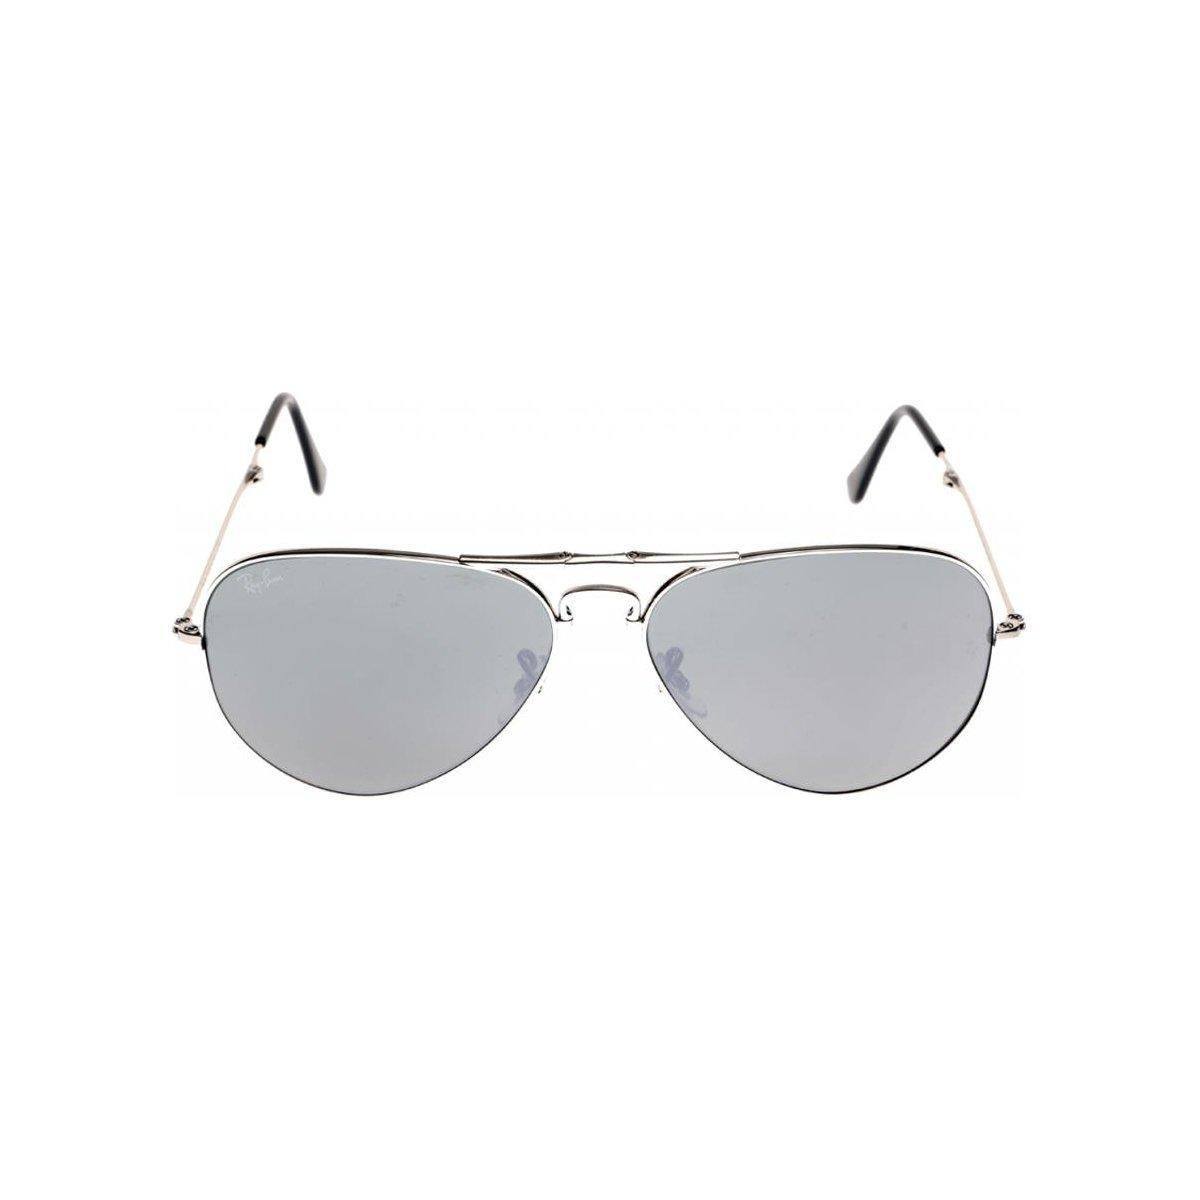 Óculos de Sol Ray Ban Aviator Folding - Compre Agora   Netshoes d1ab8566e5